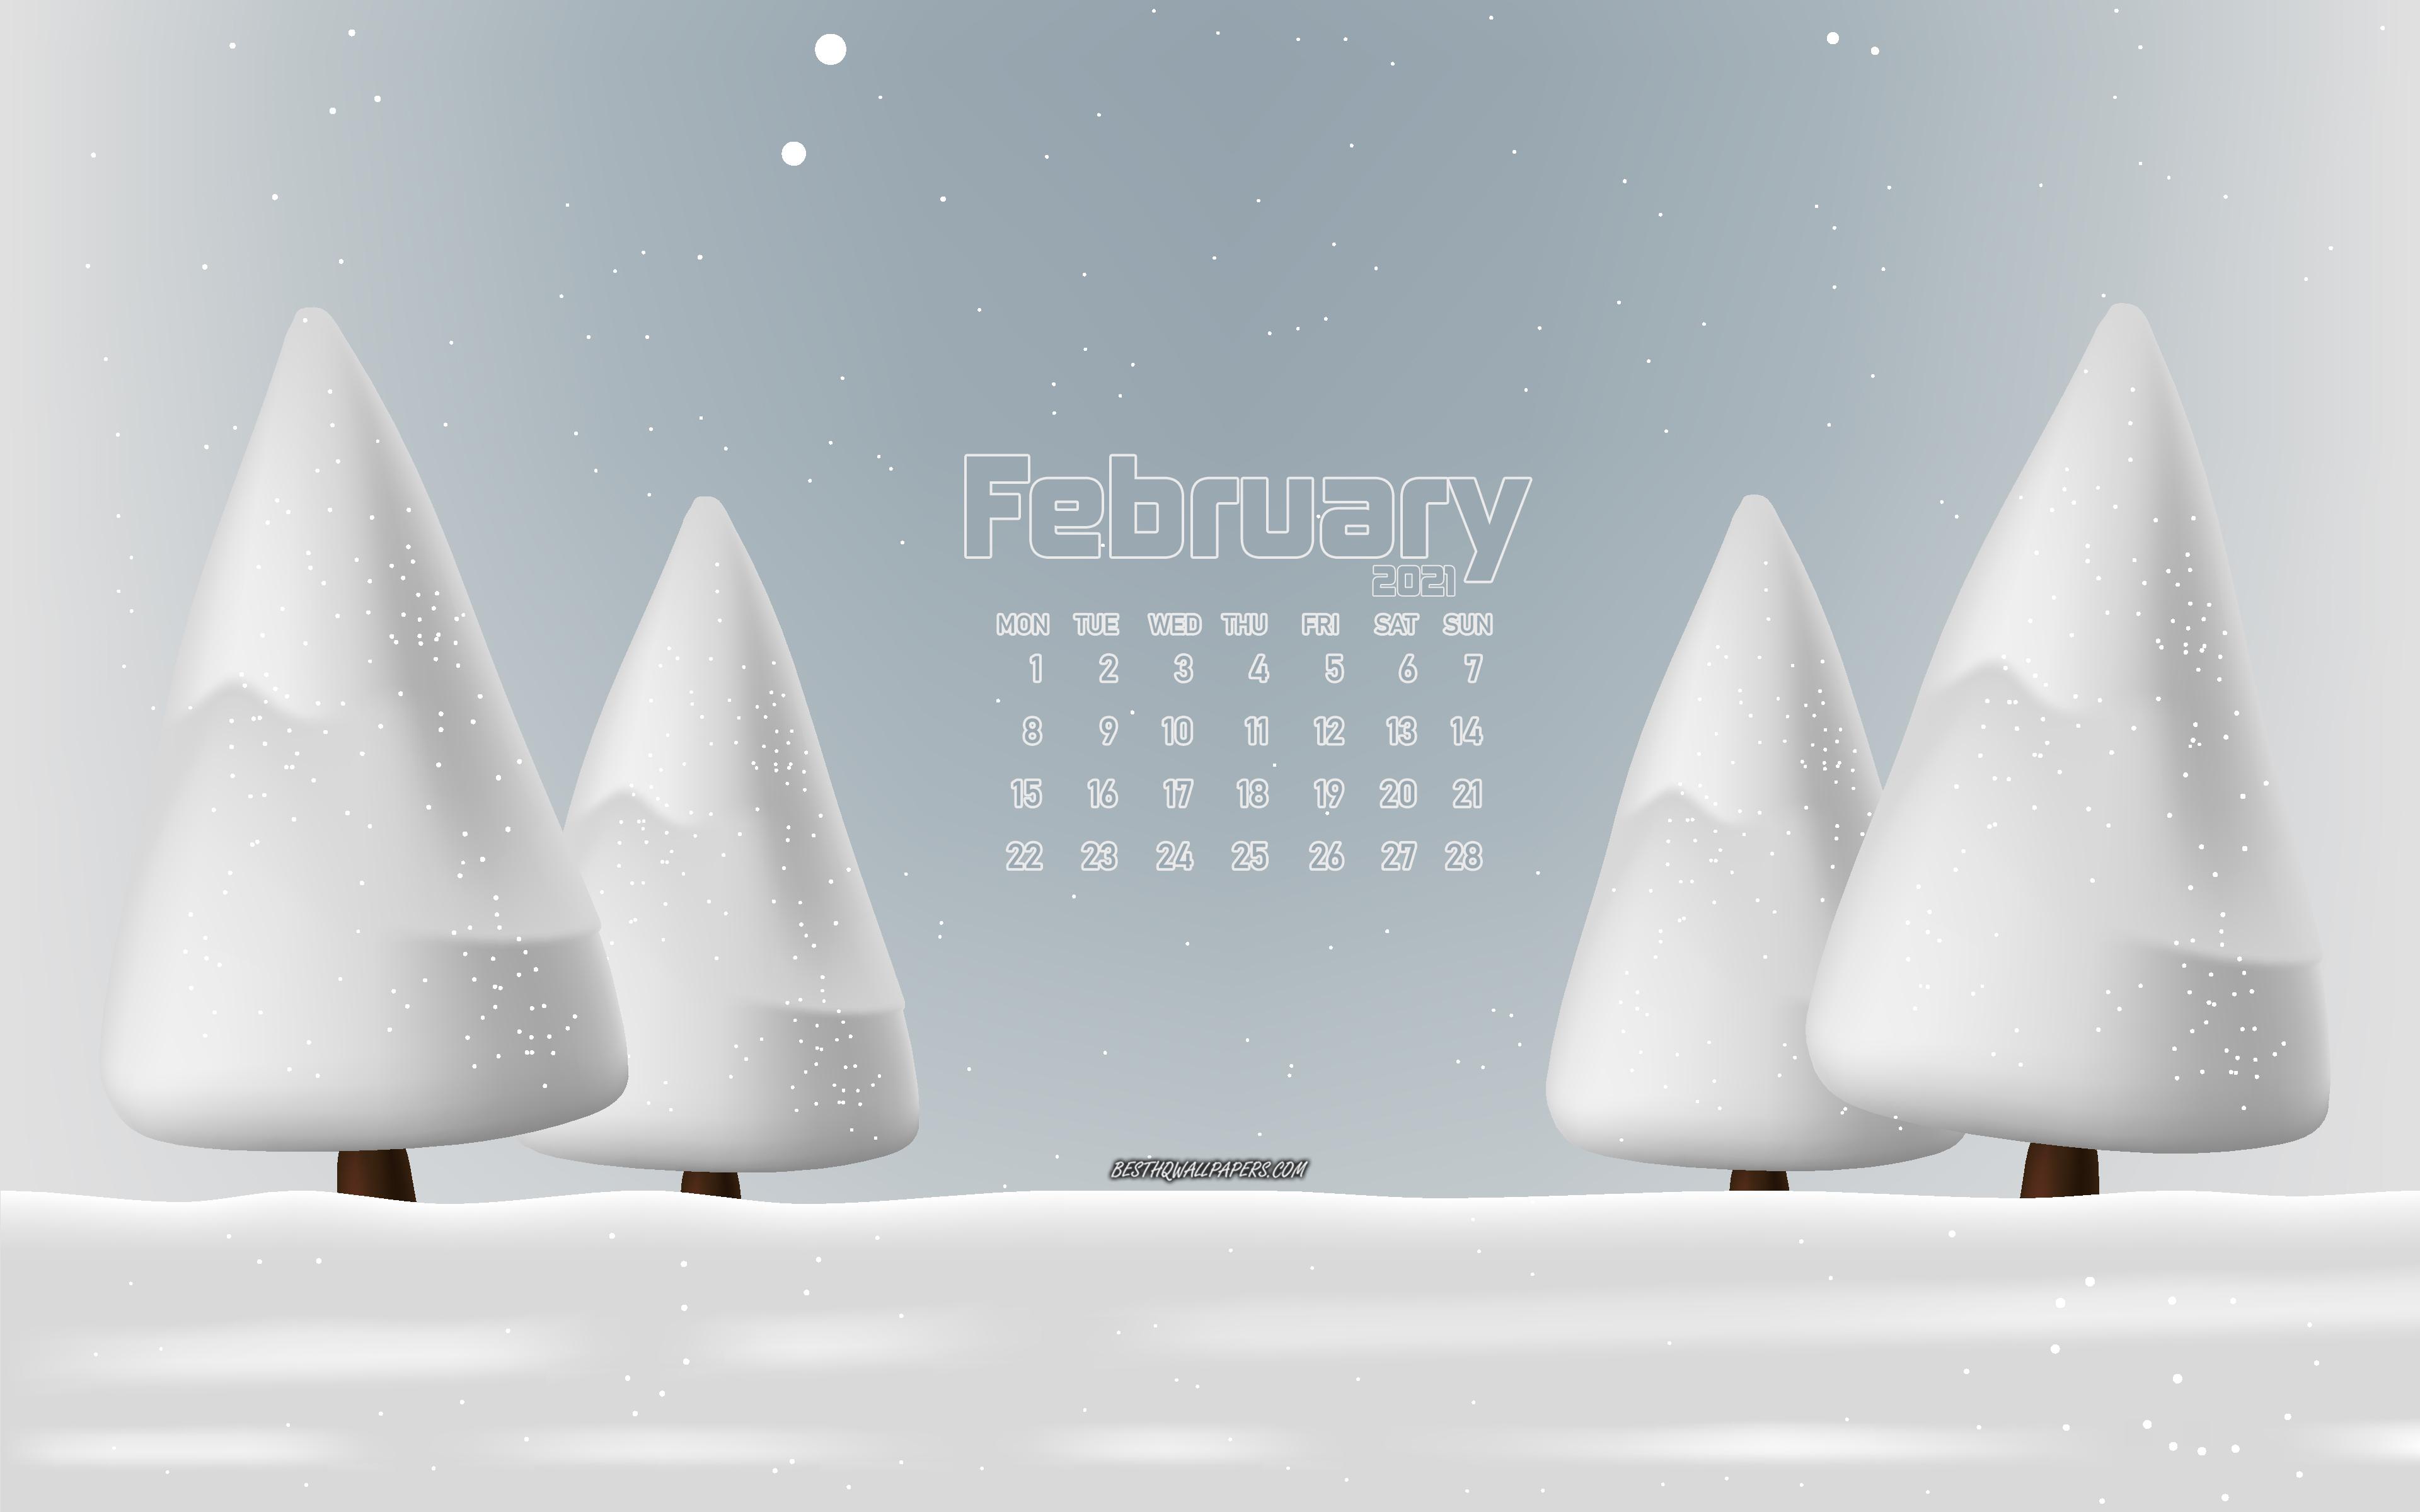 Download wallpapers 2021 February calendar 4k winter landscape 3840x2400